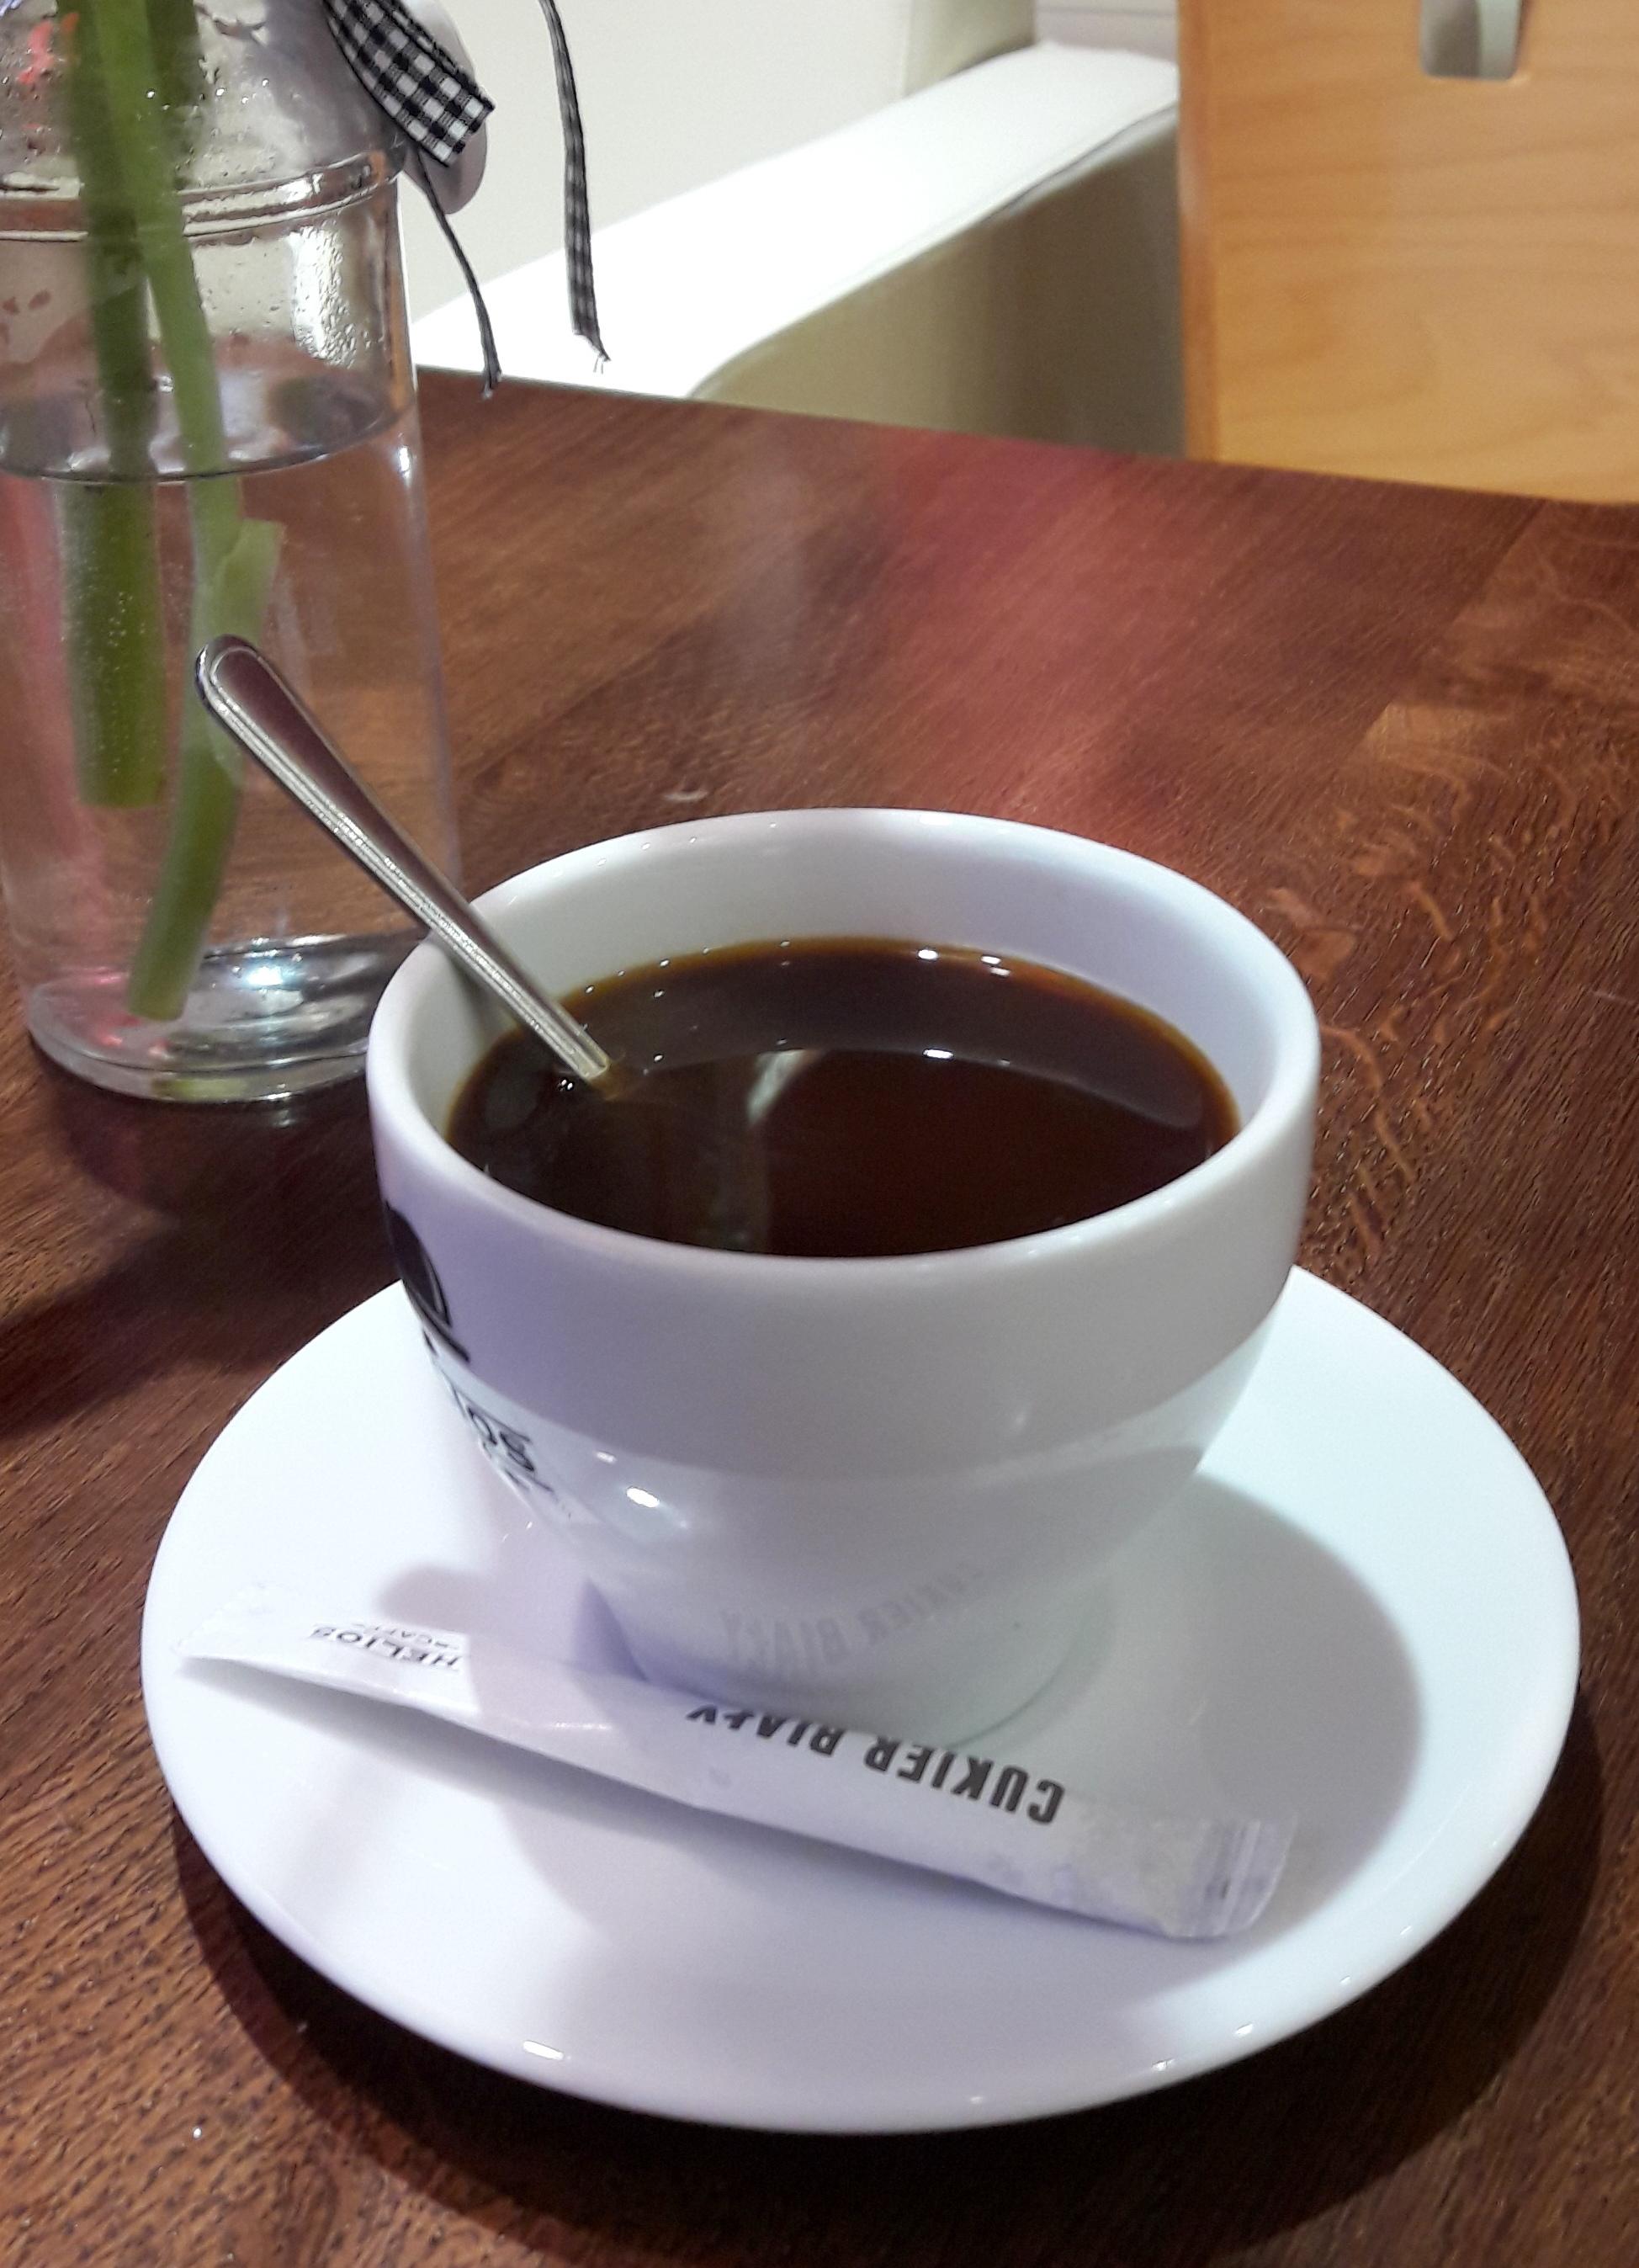 File:20170318 Eine Tasse Kaffee.jpg - Wikimedia Commons